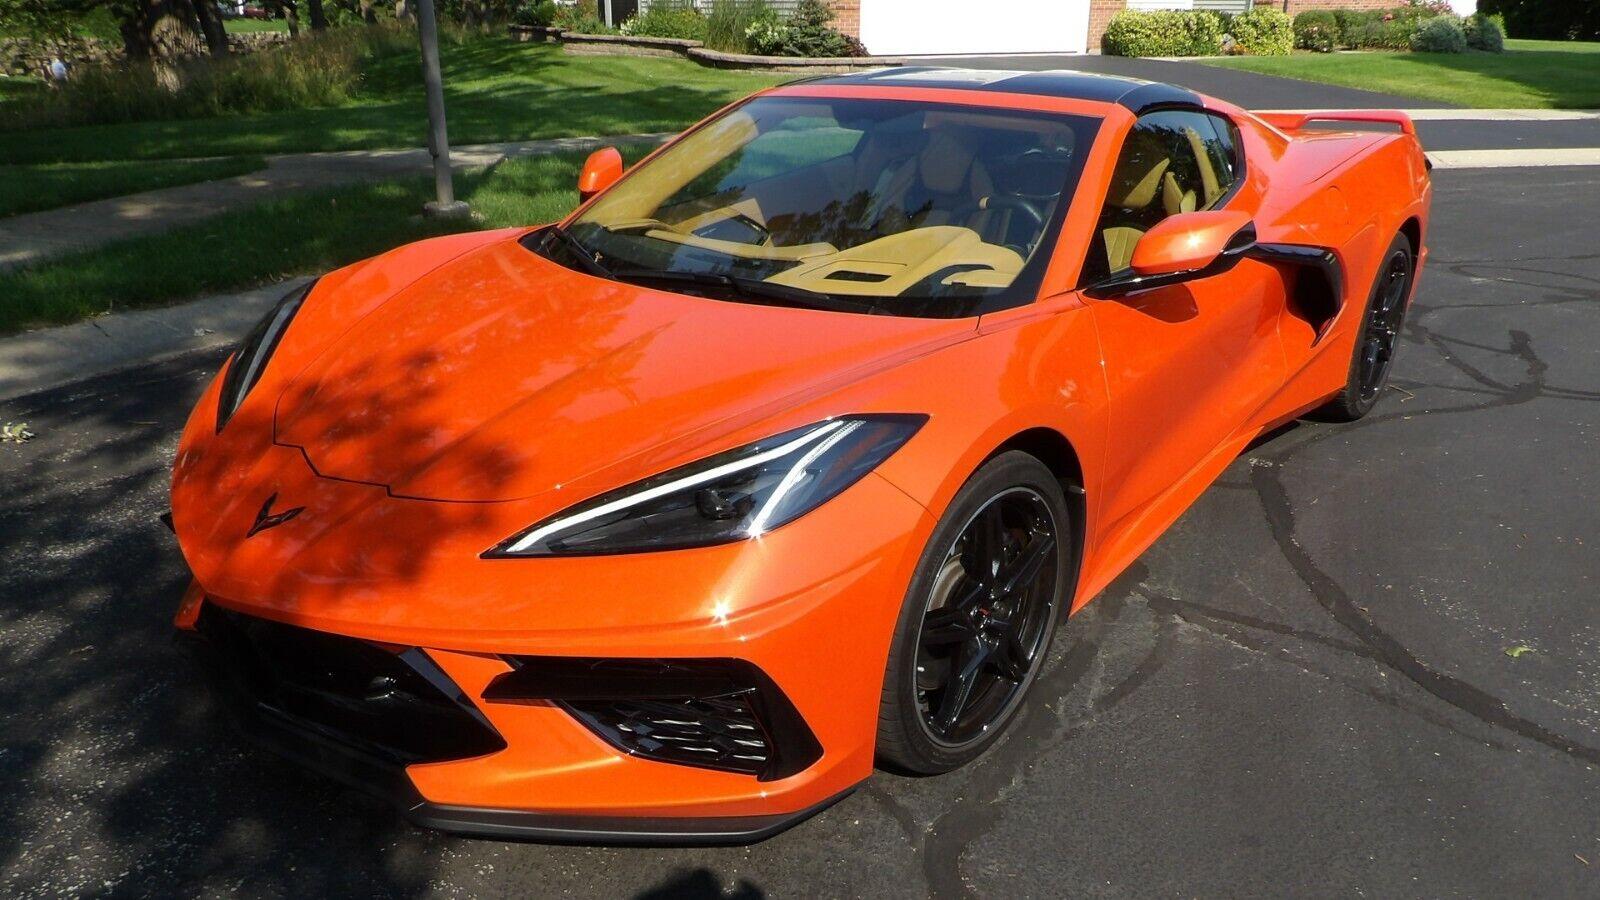 2020 Orange Chevrolet Corvette     C7 Corvette Photo 1